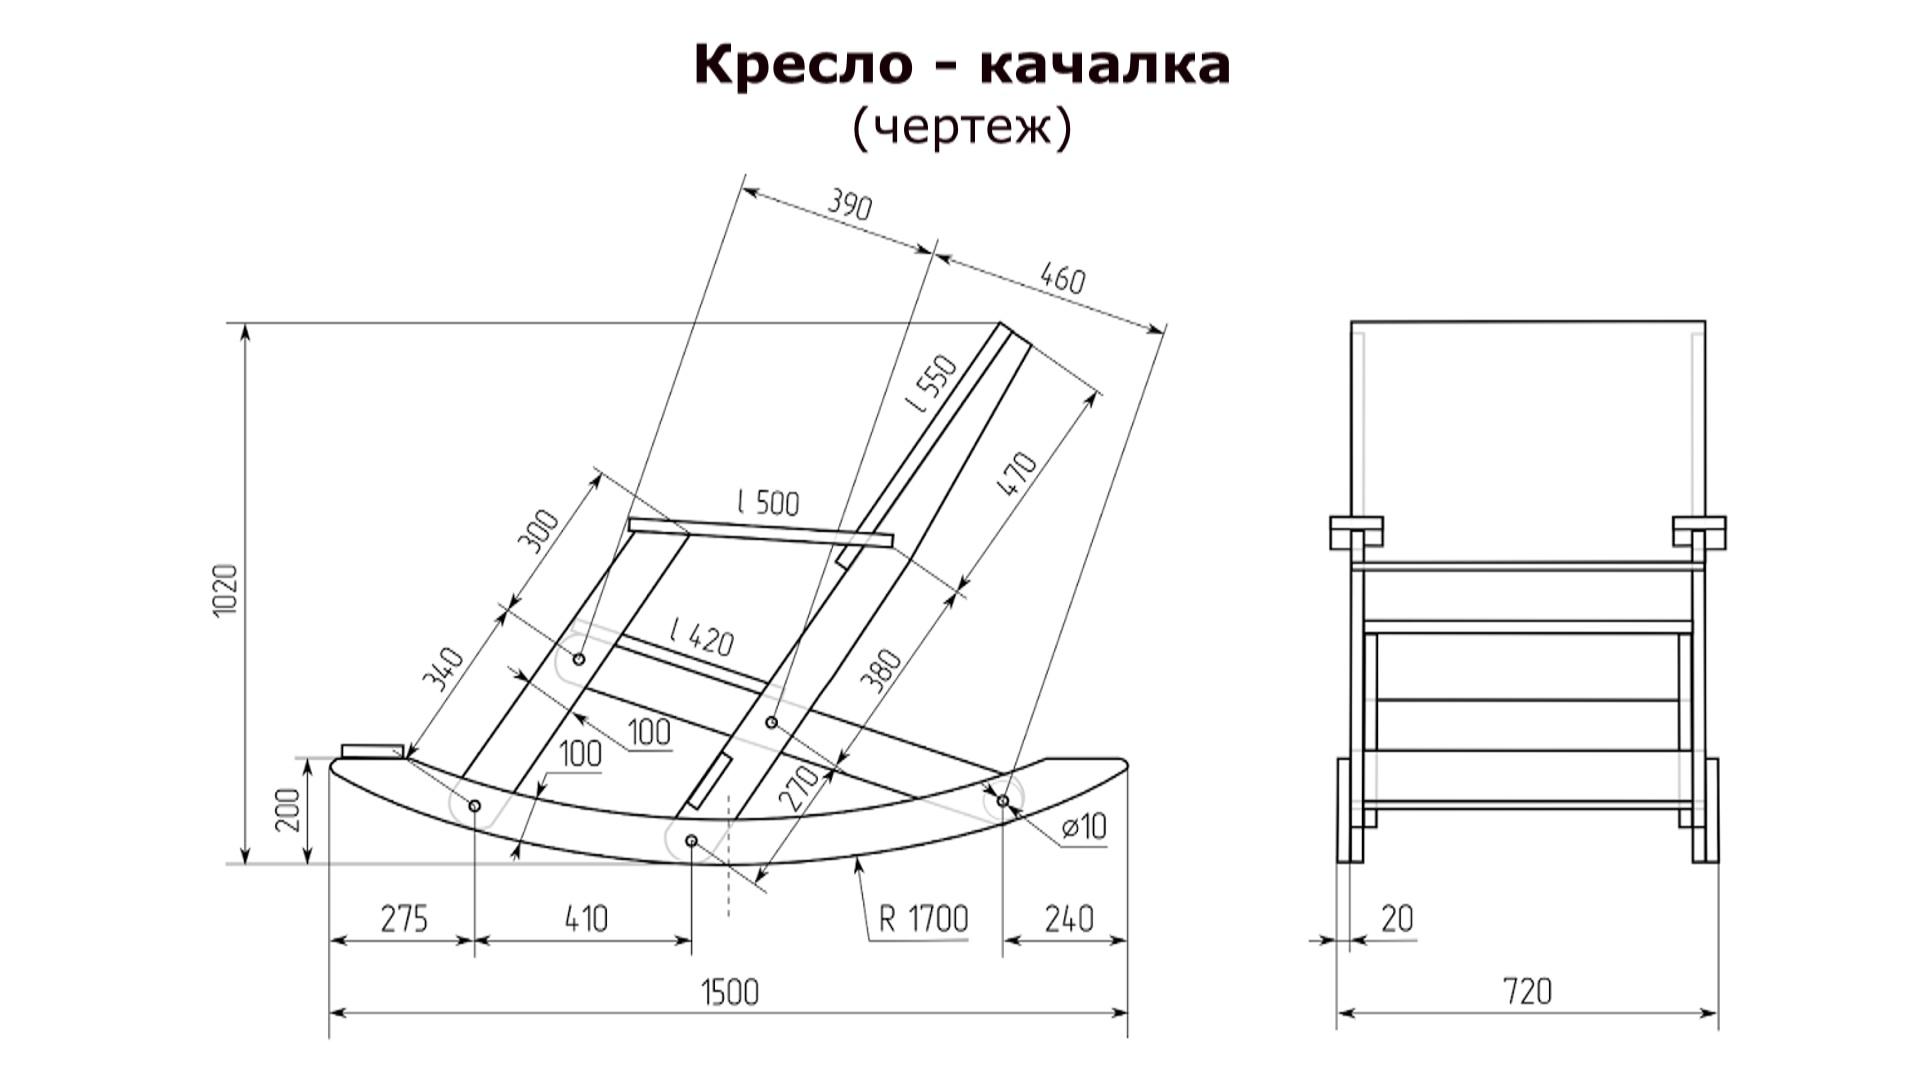 C:\Users\Дедуля\Desktop\кресло1.jpg